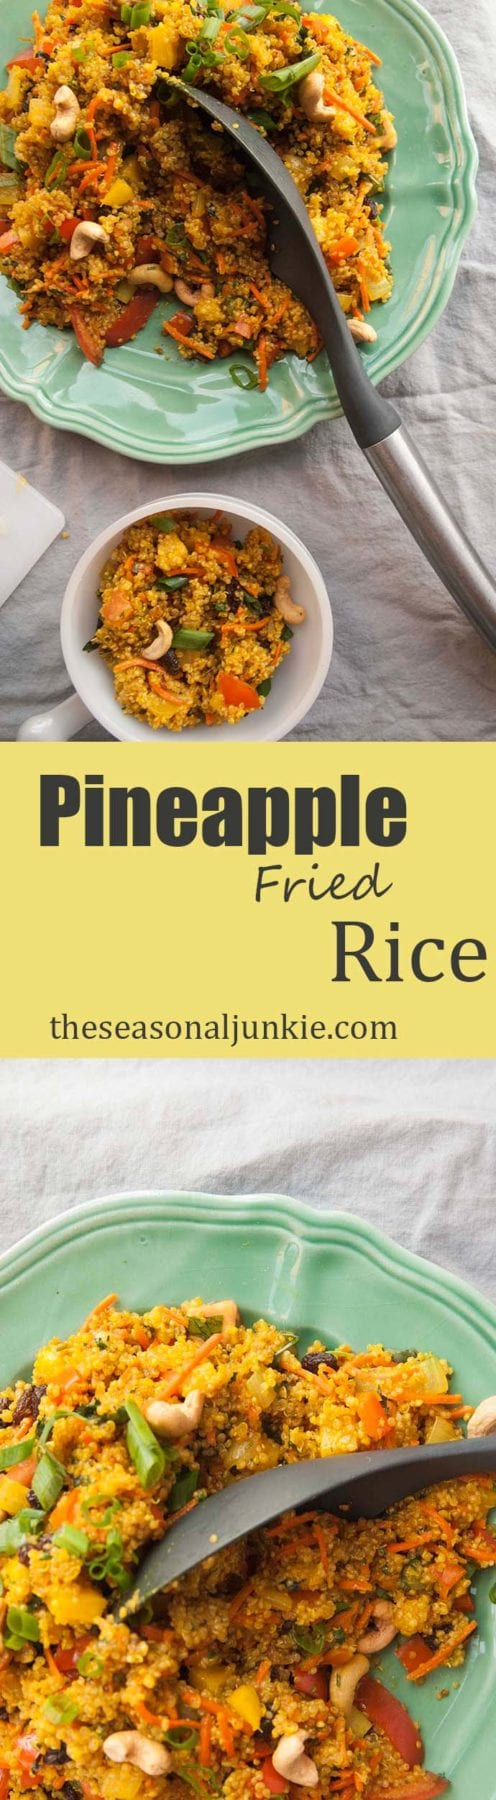 Pineapple Fried Rice-The Seasonal Junkie